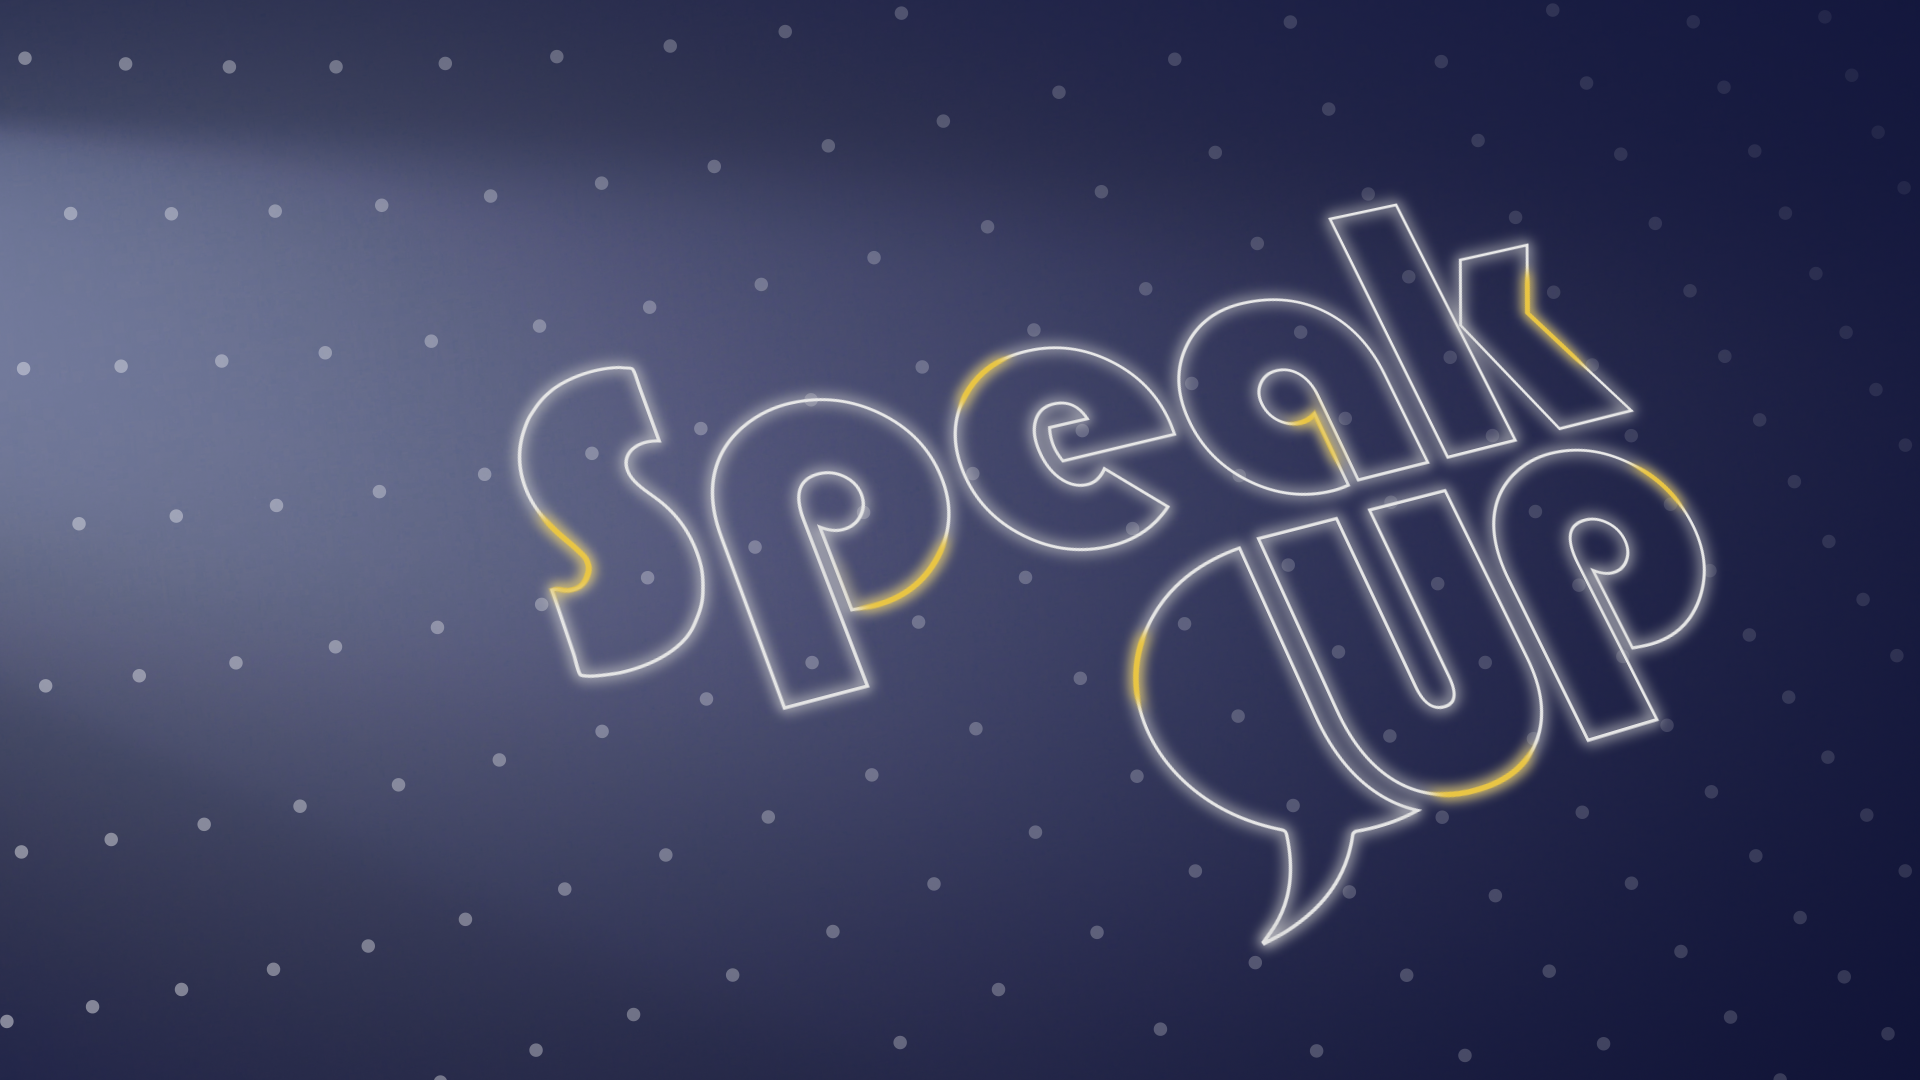 Speak UP Season 2 - Season 2